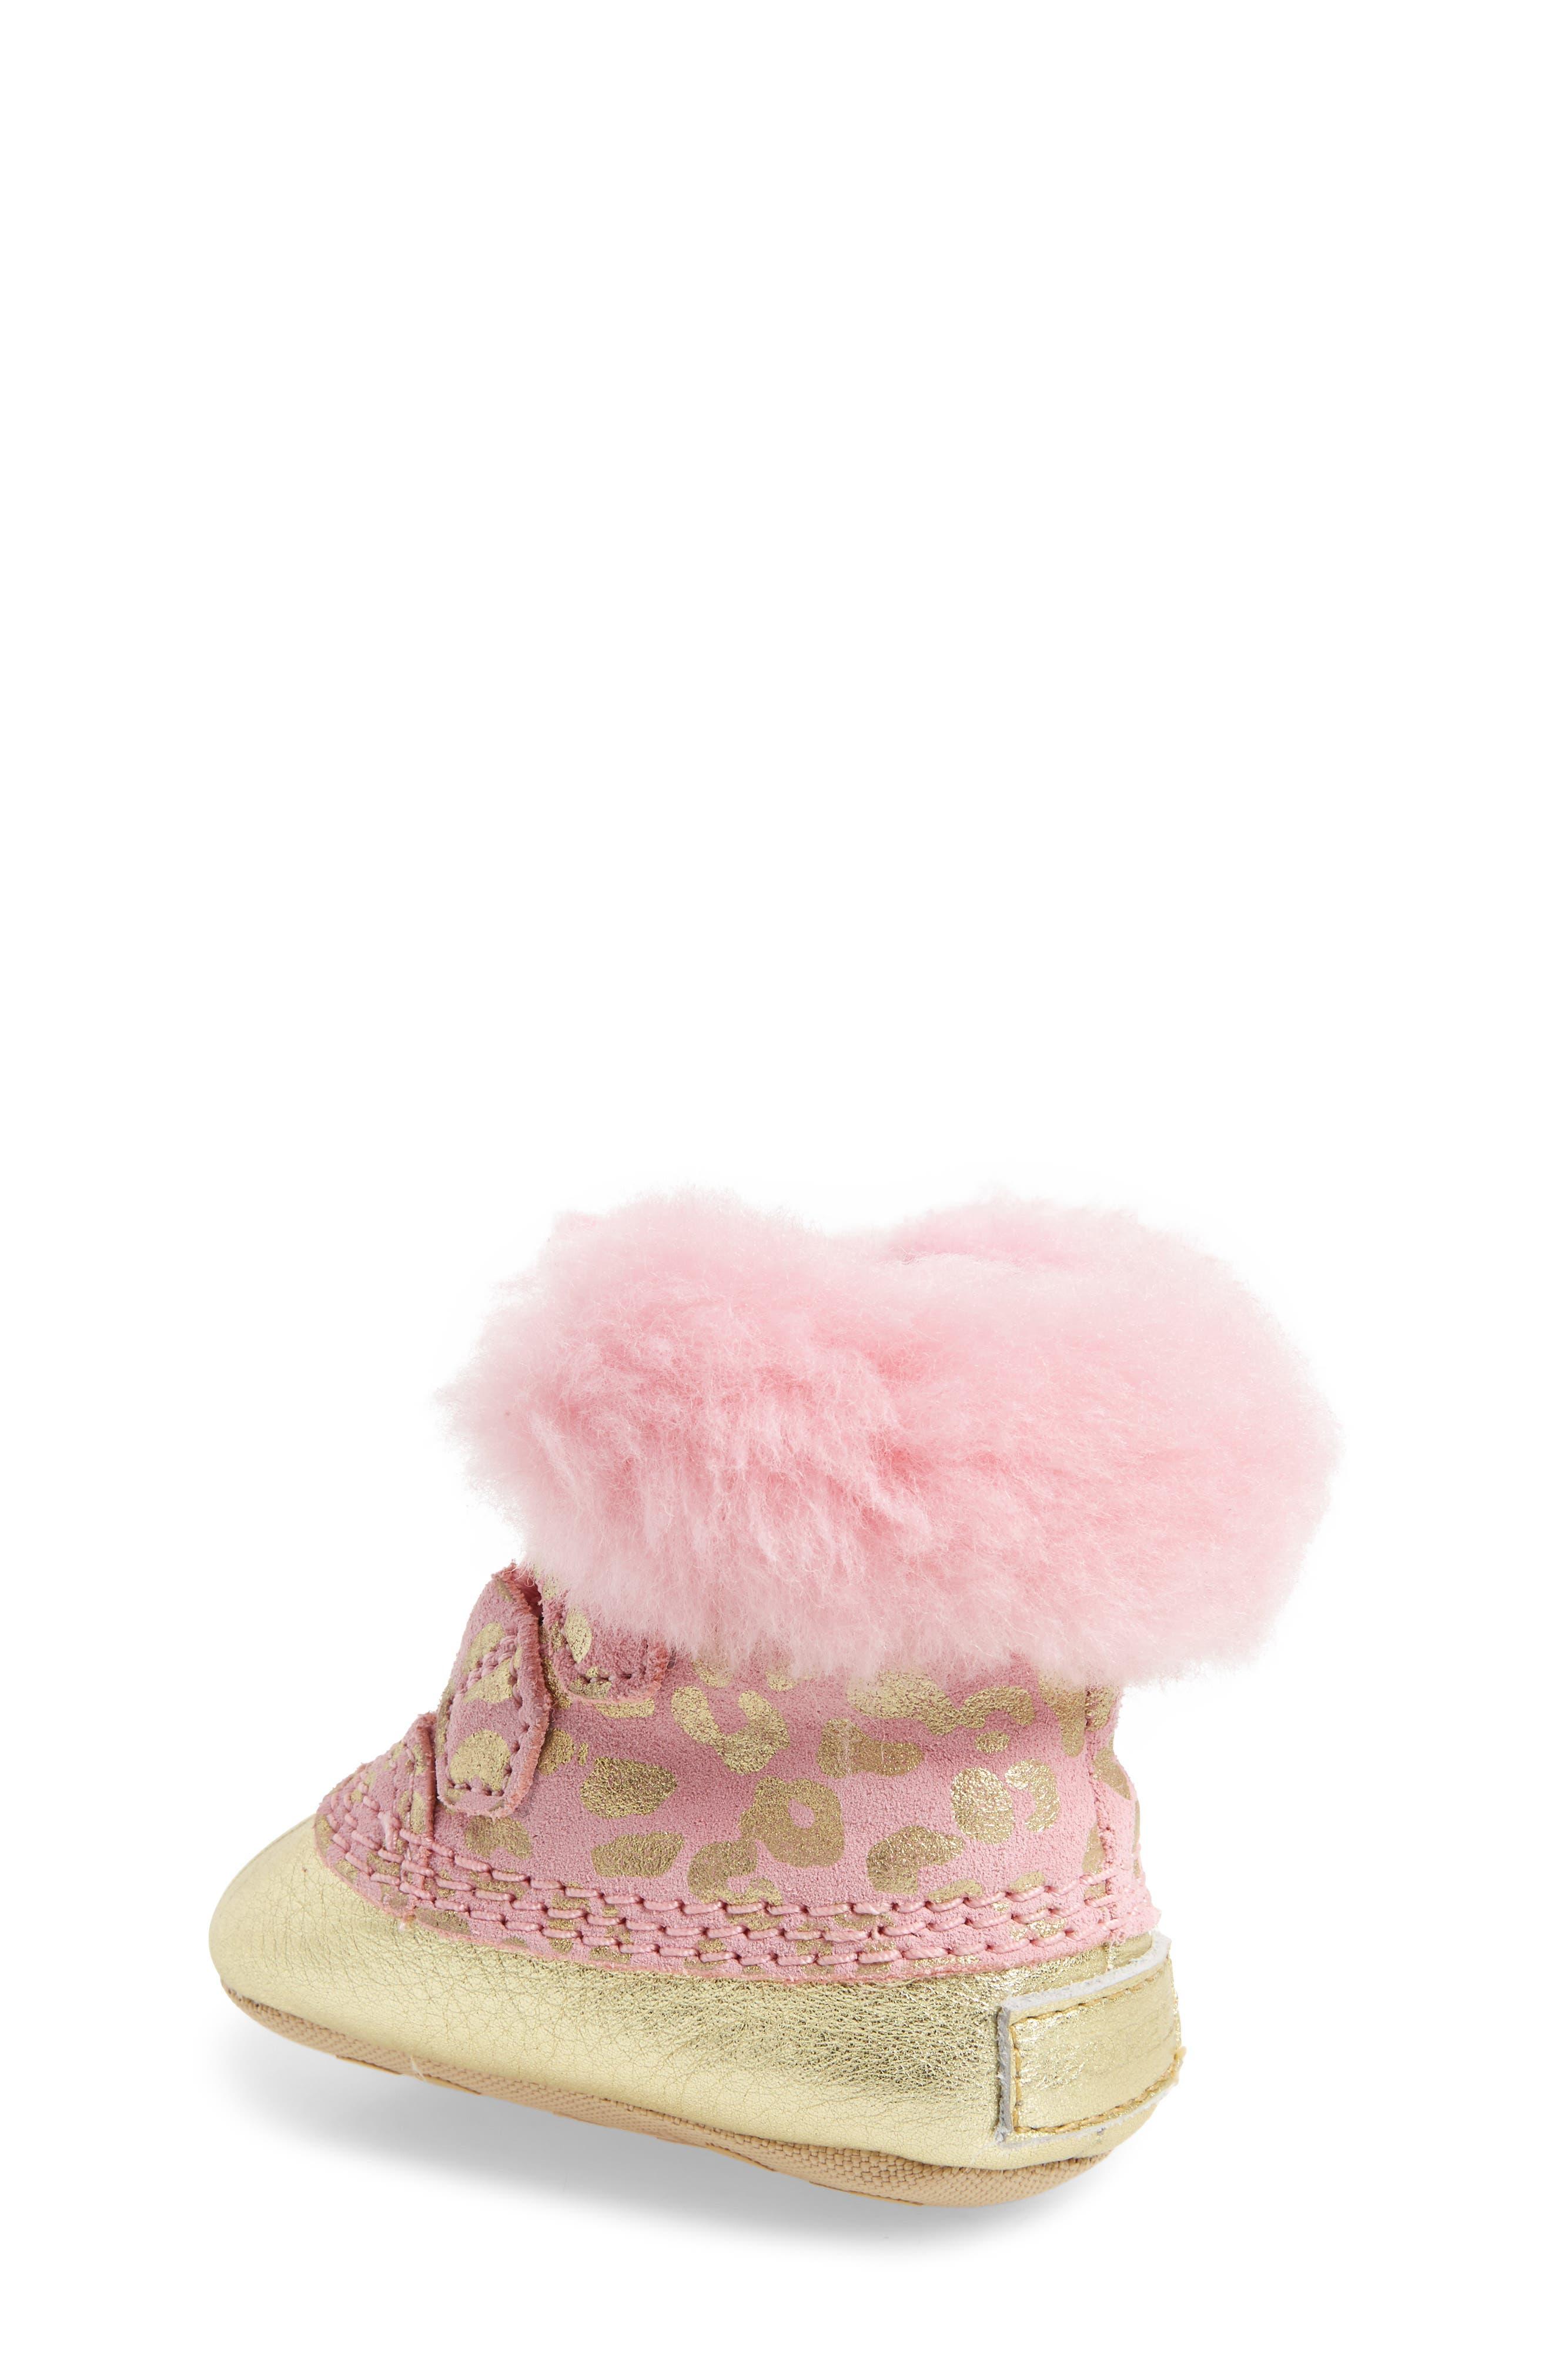 Caribootie Genuine Shearling Crib Shoe,                             Alternate thumbnail 12, color,